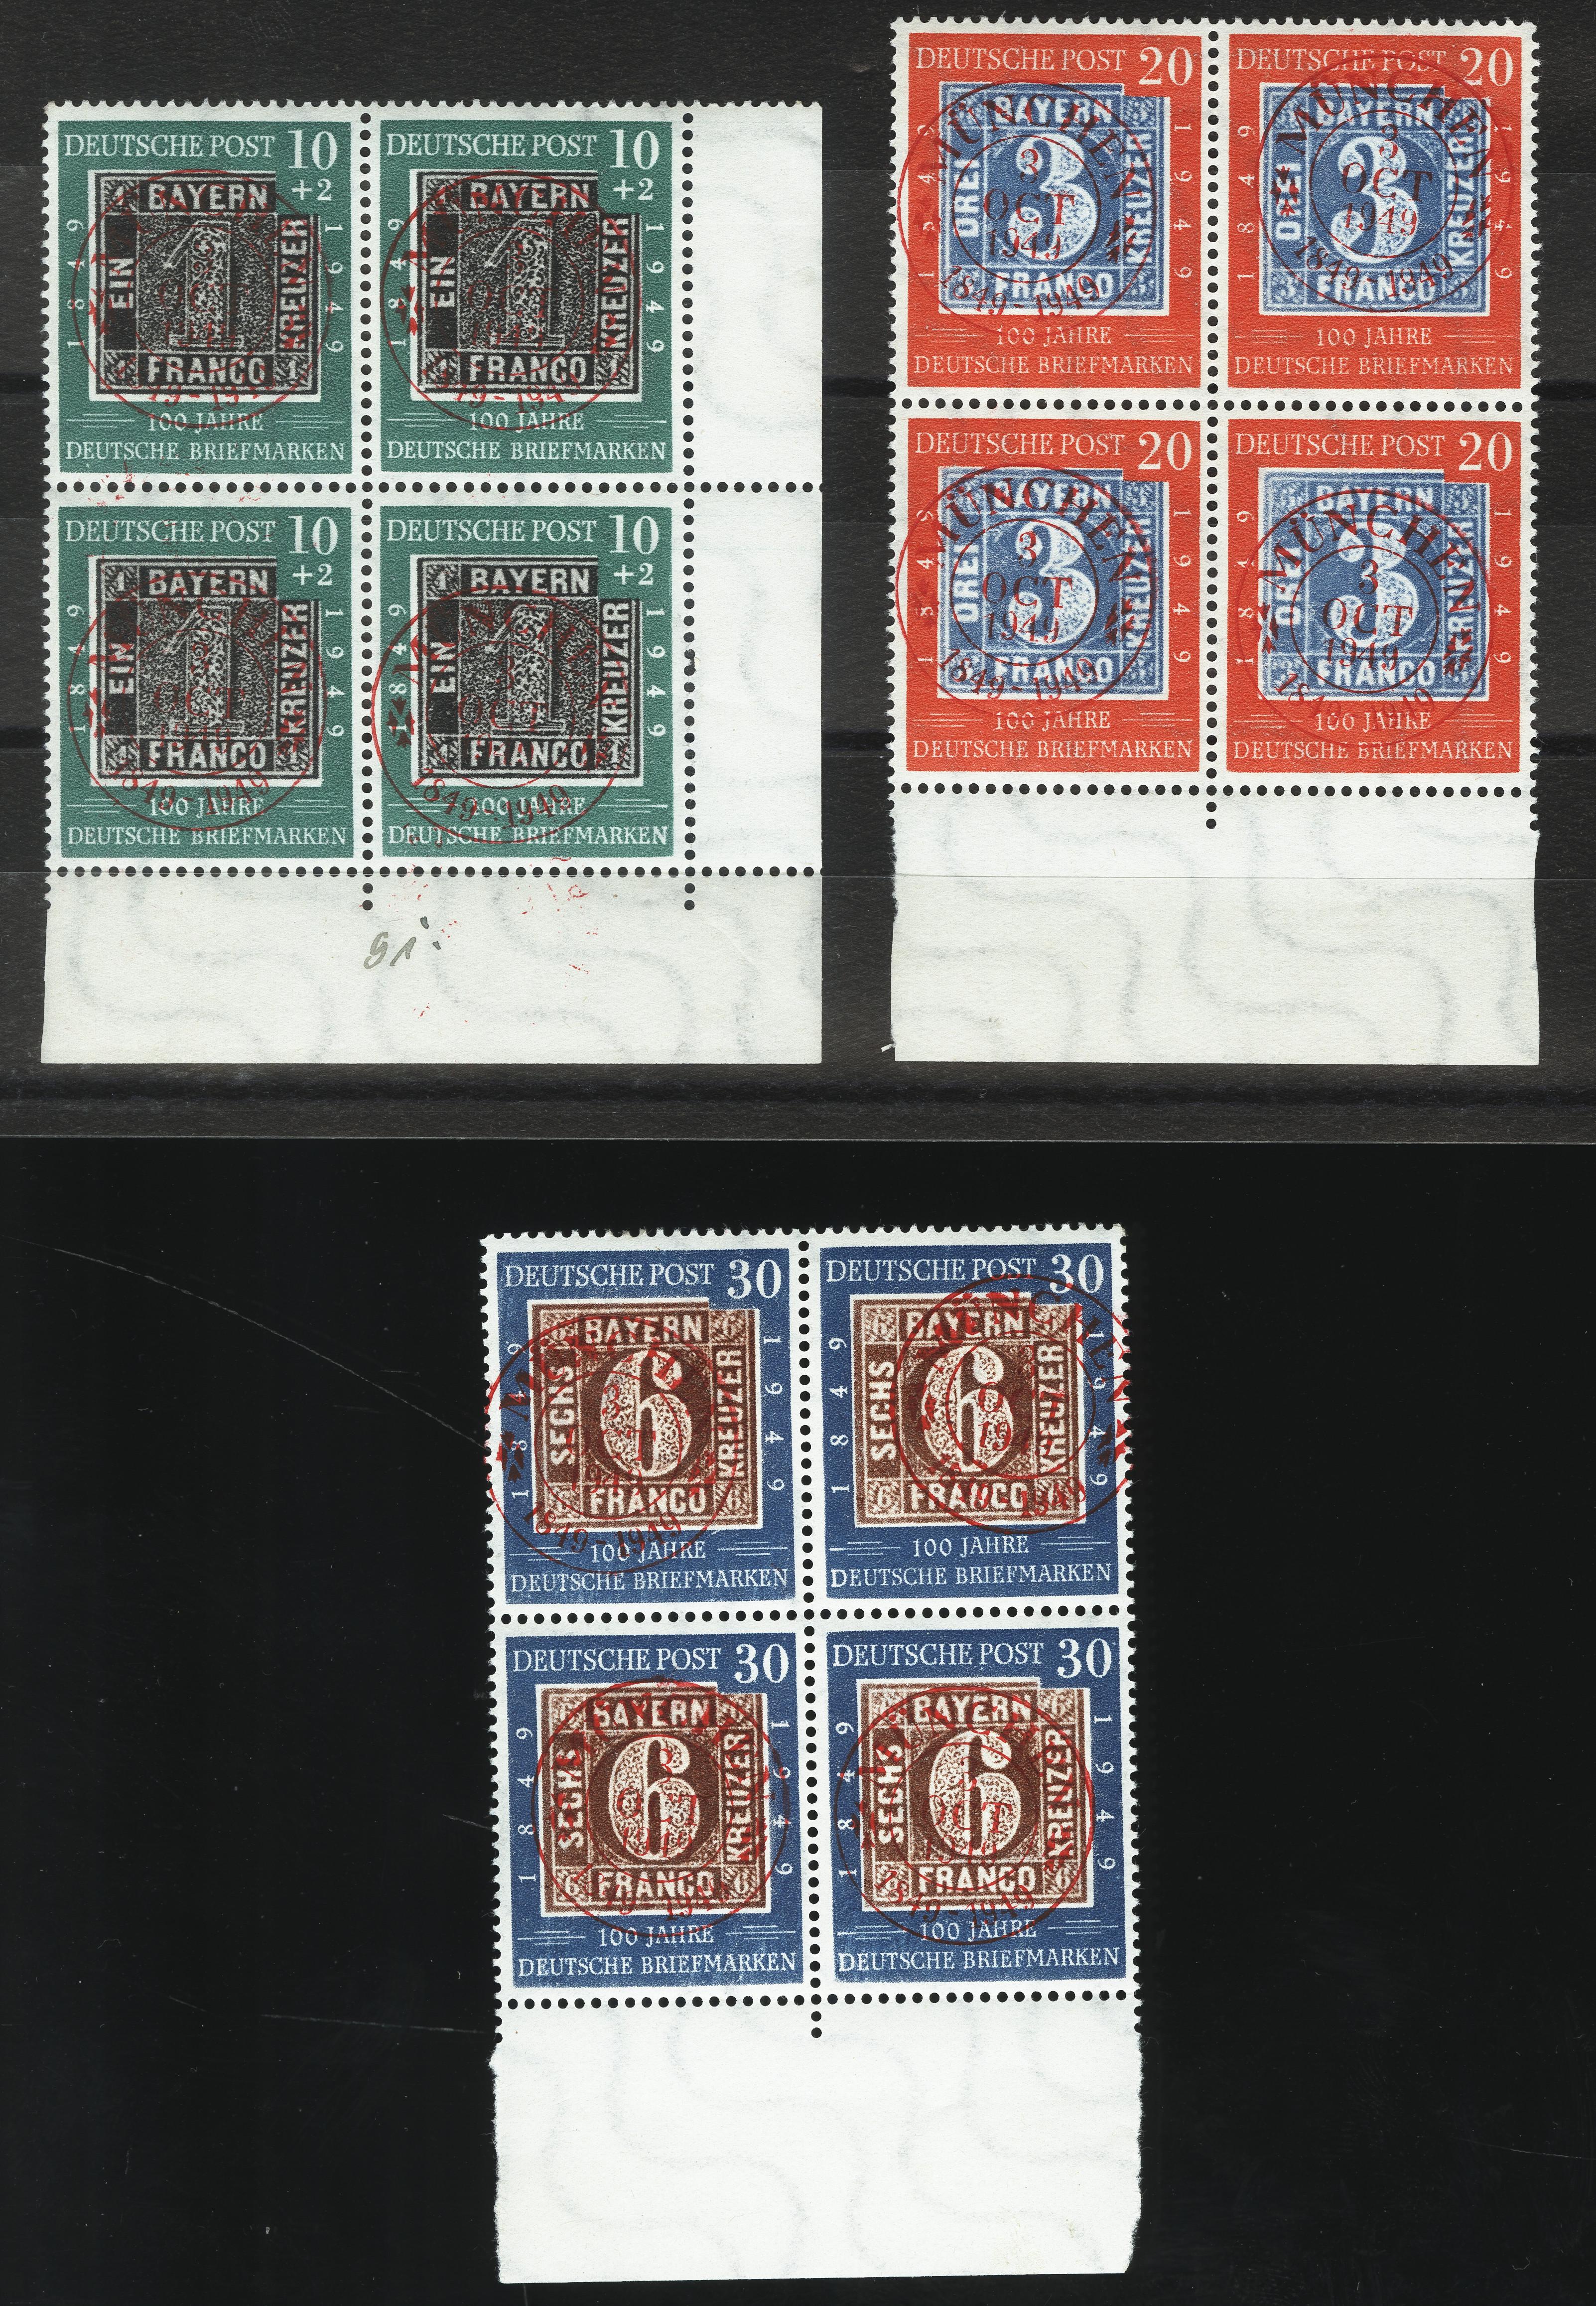 Lot 2808 - germany after 1945 federal republic of germany -  Heinrich Koehler Auktionen Heinrich Köhler Auction 376 - Day 1